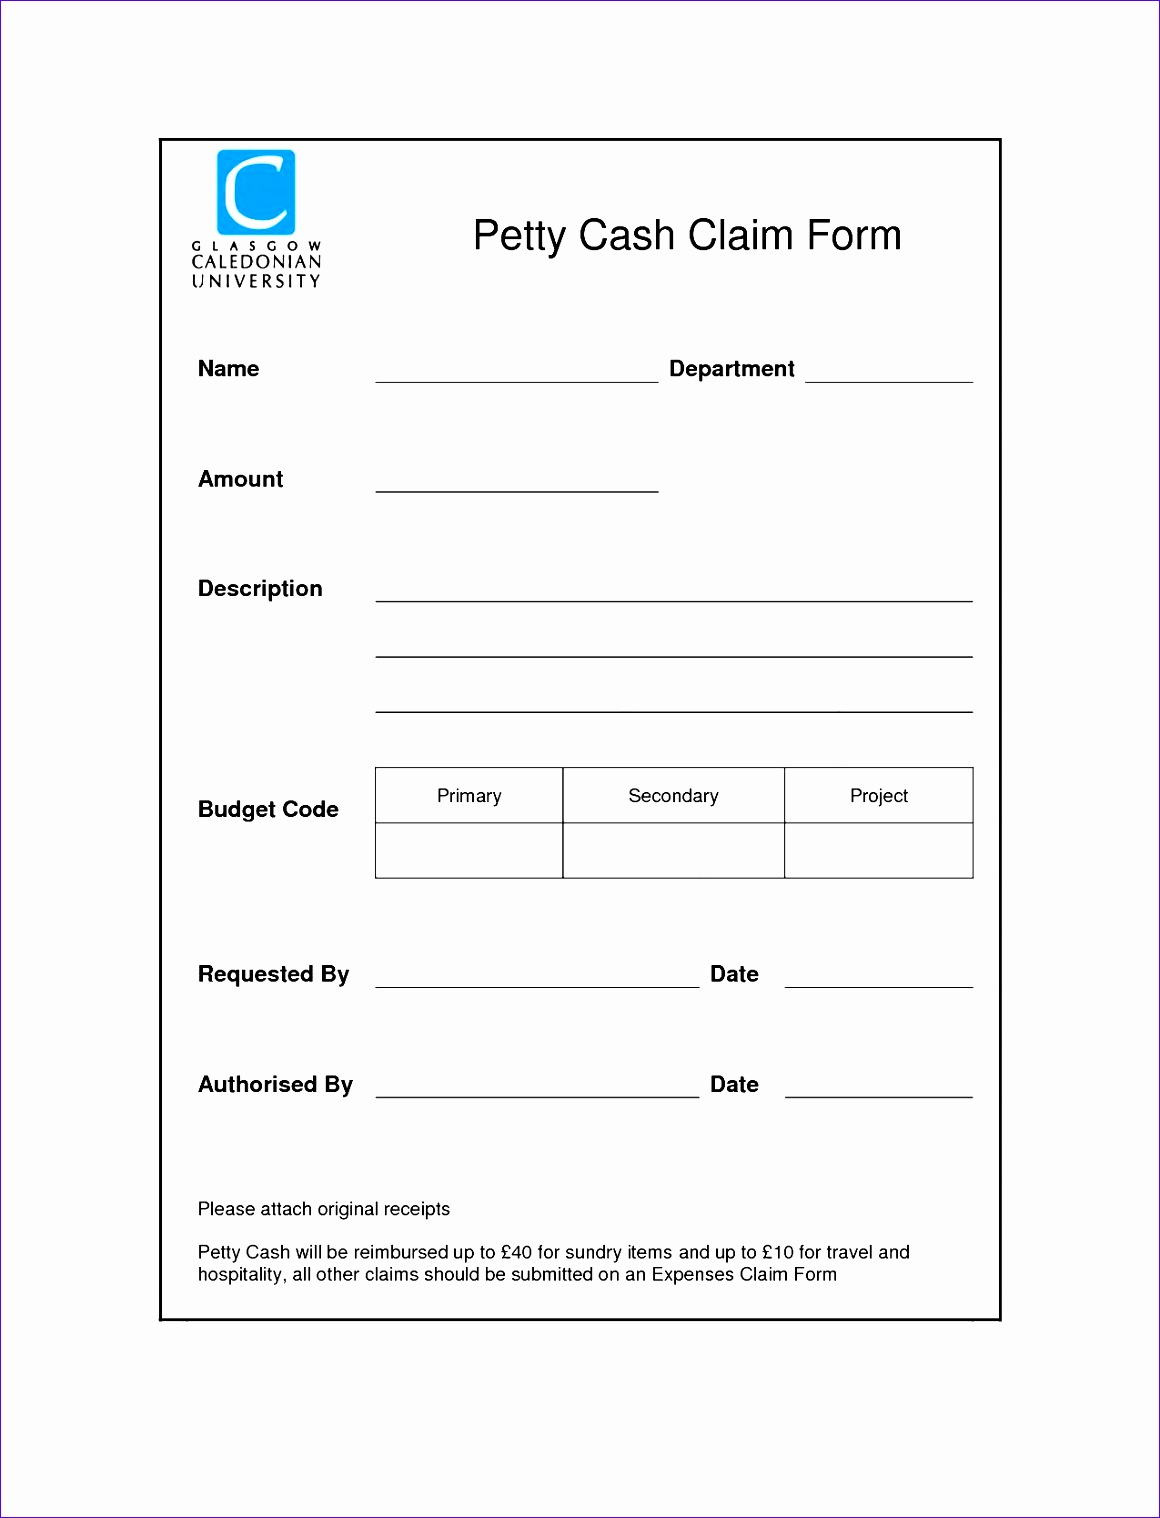 petty cash replenishment form template 11601518